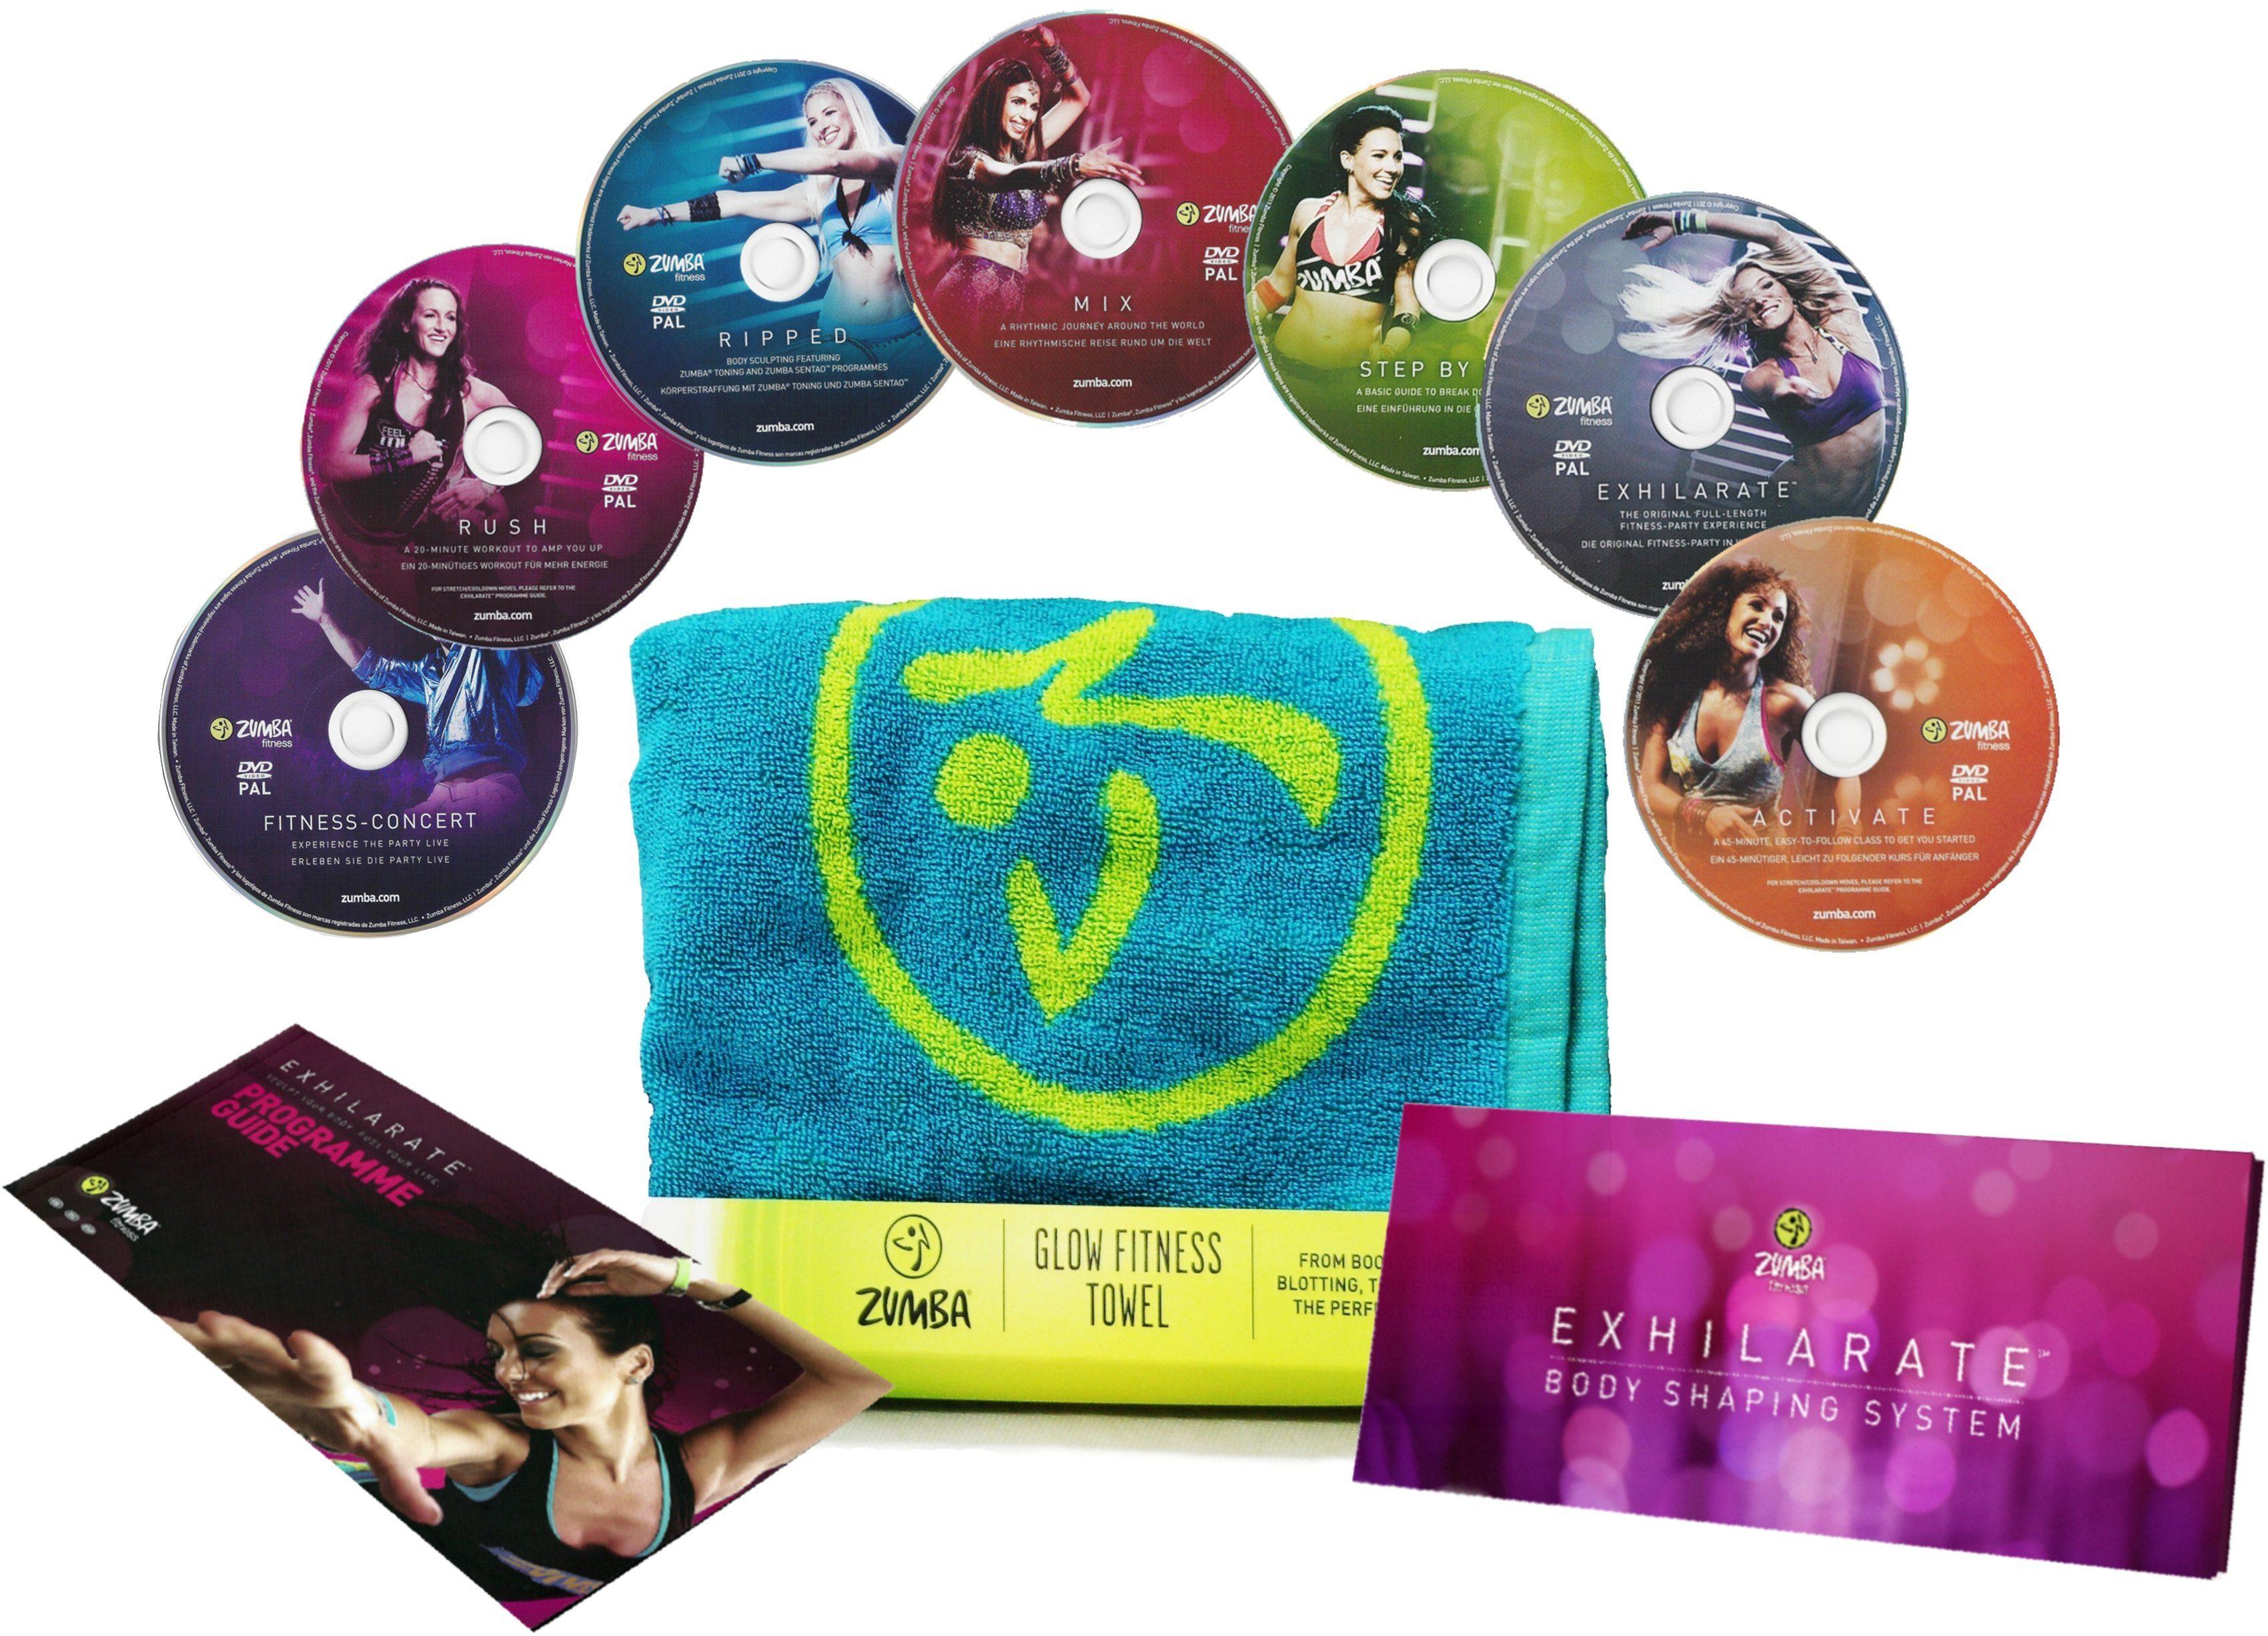 Zumba® Fitness Workout DVD Set, »Zumba® 7tlg. Exhilarate DVD-Set mit Glow Fitness Towel«